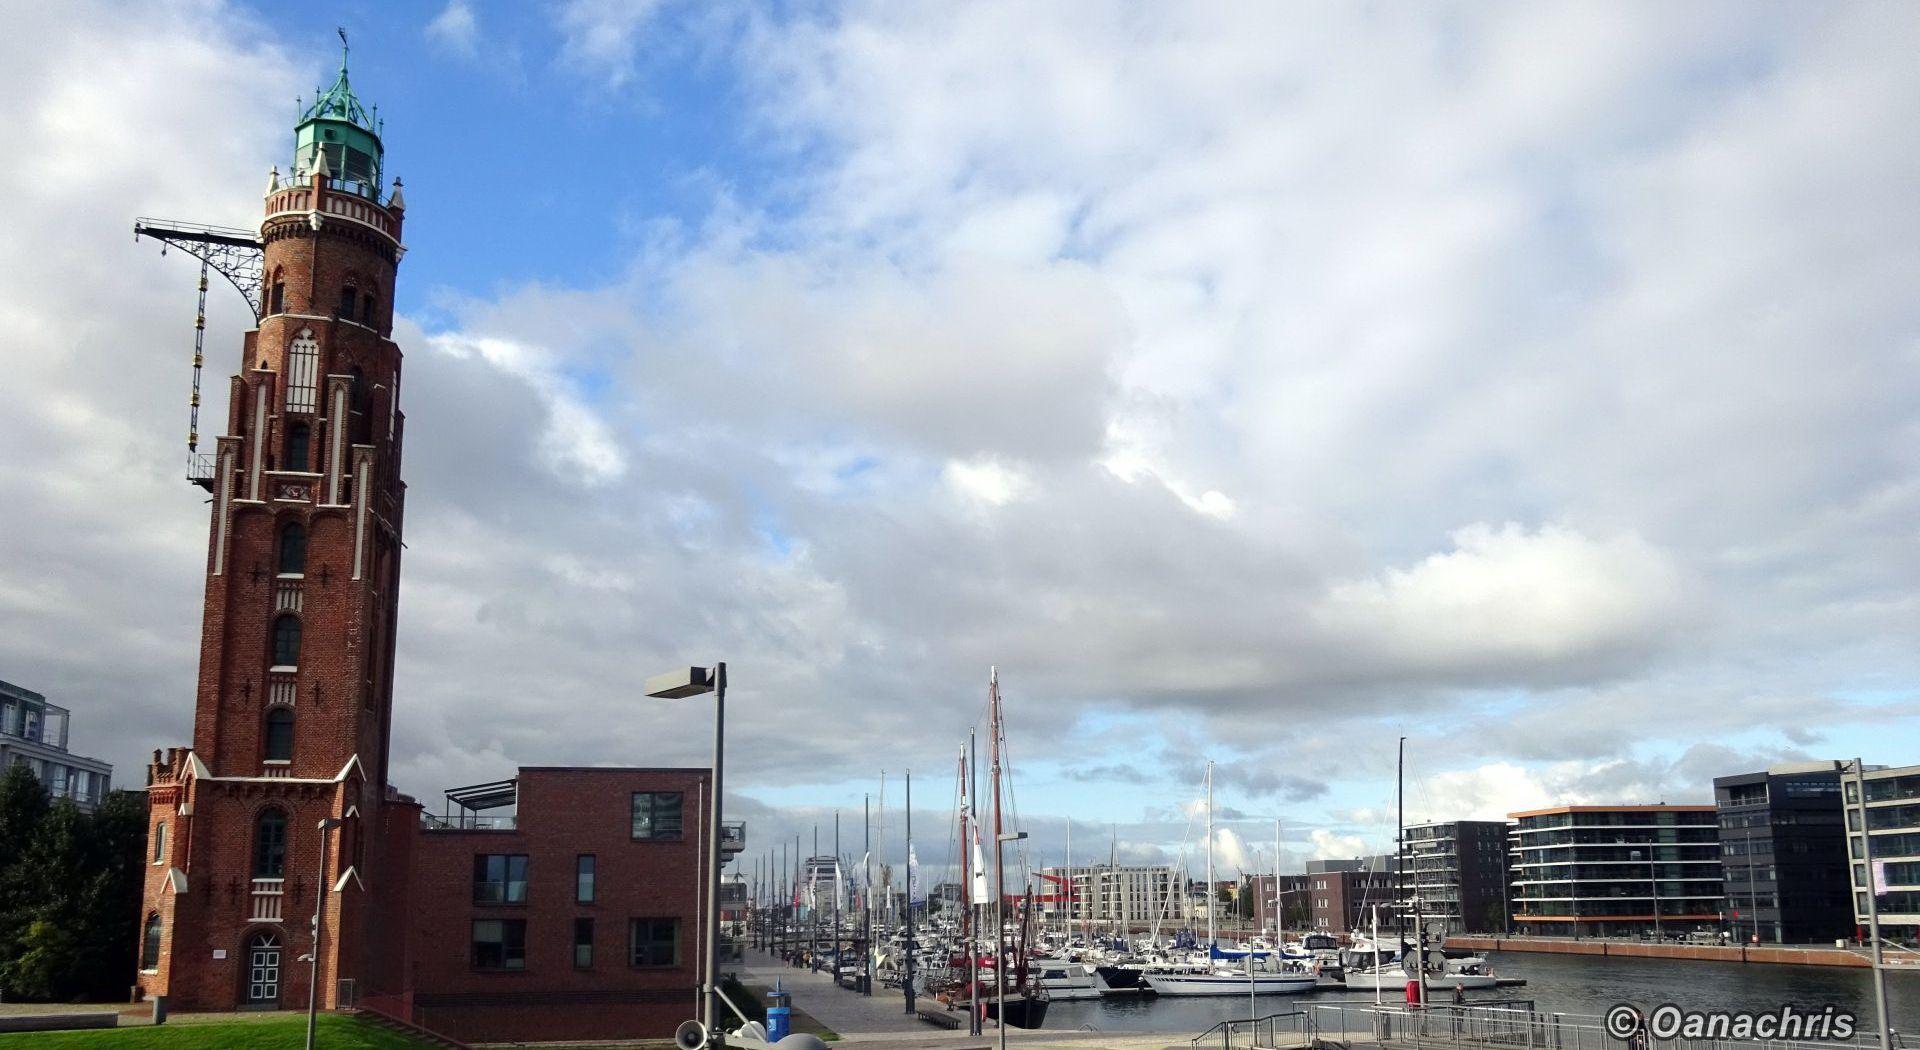 Going ashore in Bremerhaven